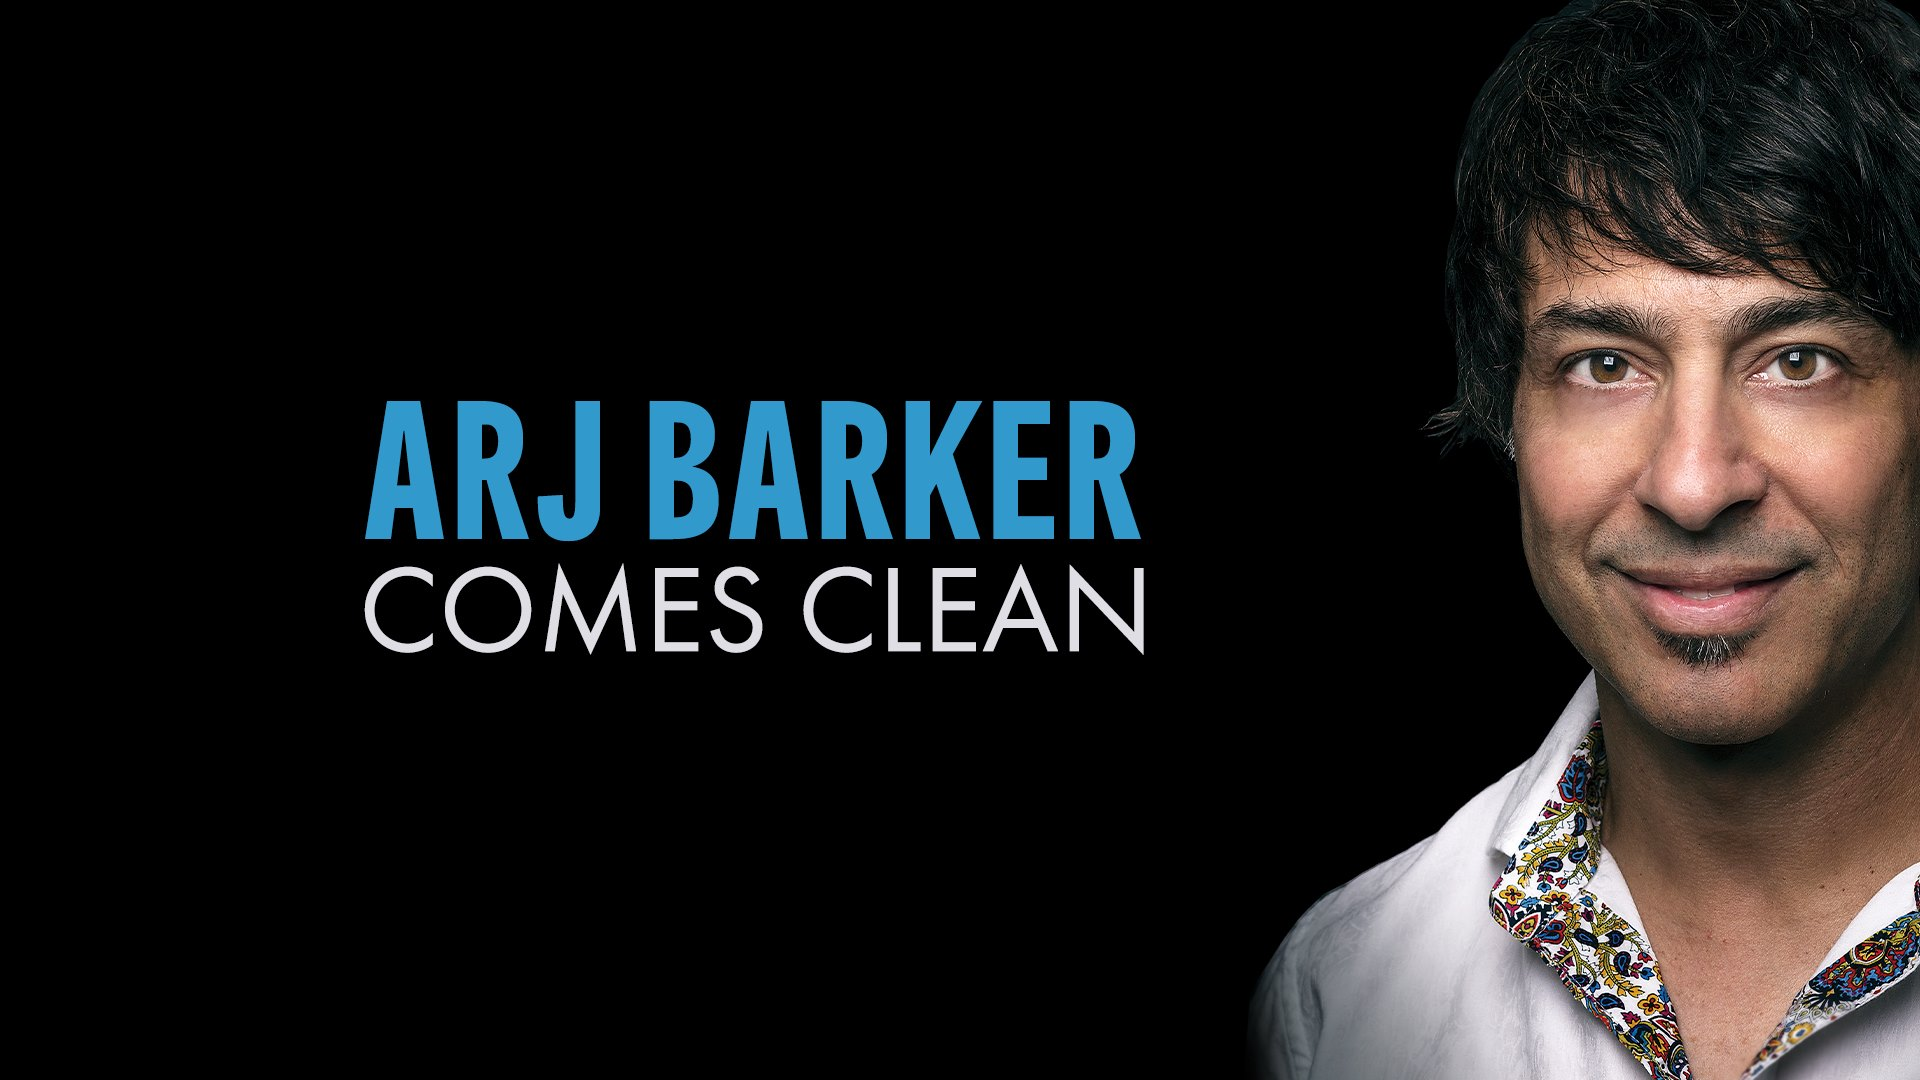 Arj Barker Comes Clean